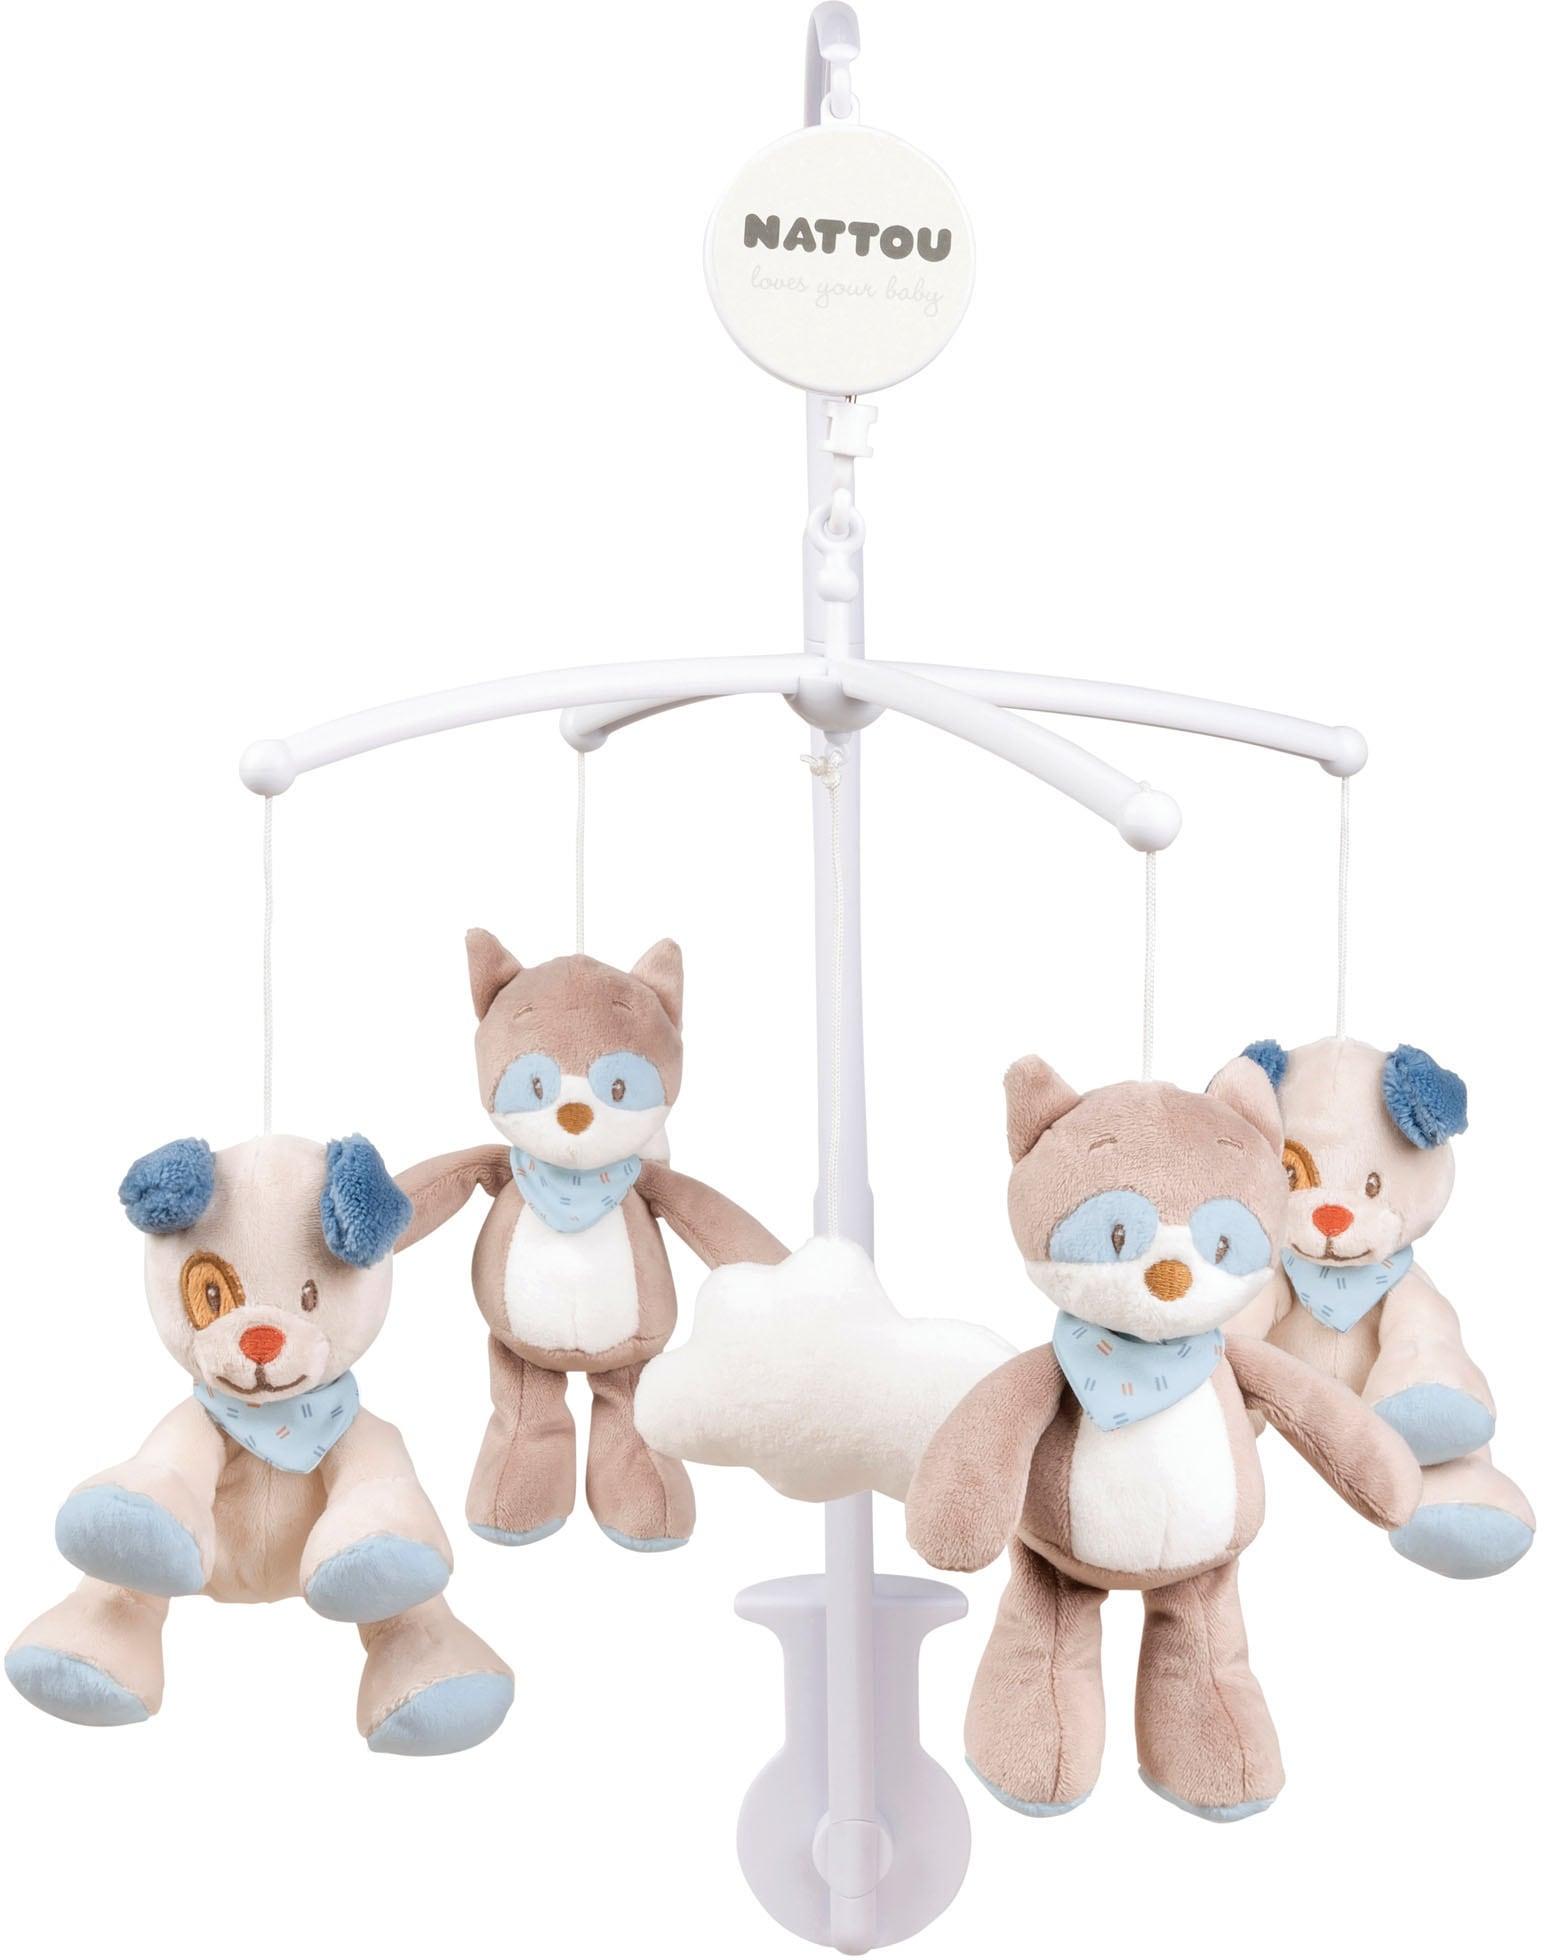 Nattou Mobile Jim & Bob bunt Kinder Mobiles Baby Kleinkind